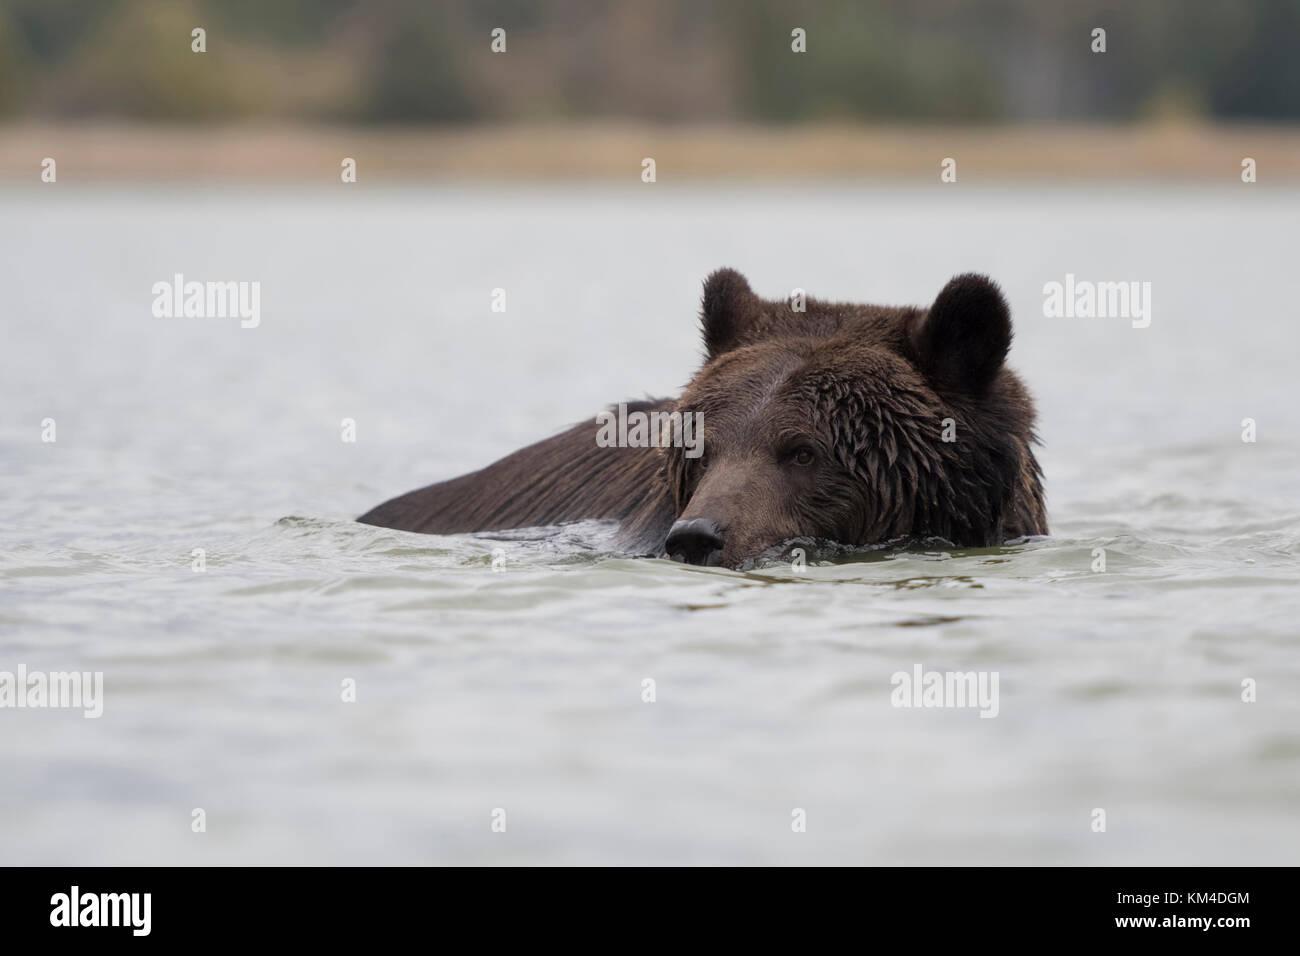 bear take a bath stock photos bear take a bath stock images alamy. Black Bedroom Furniture Sets. Home Design Ideas